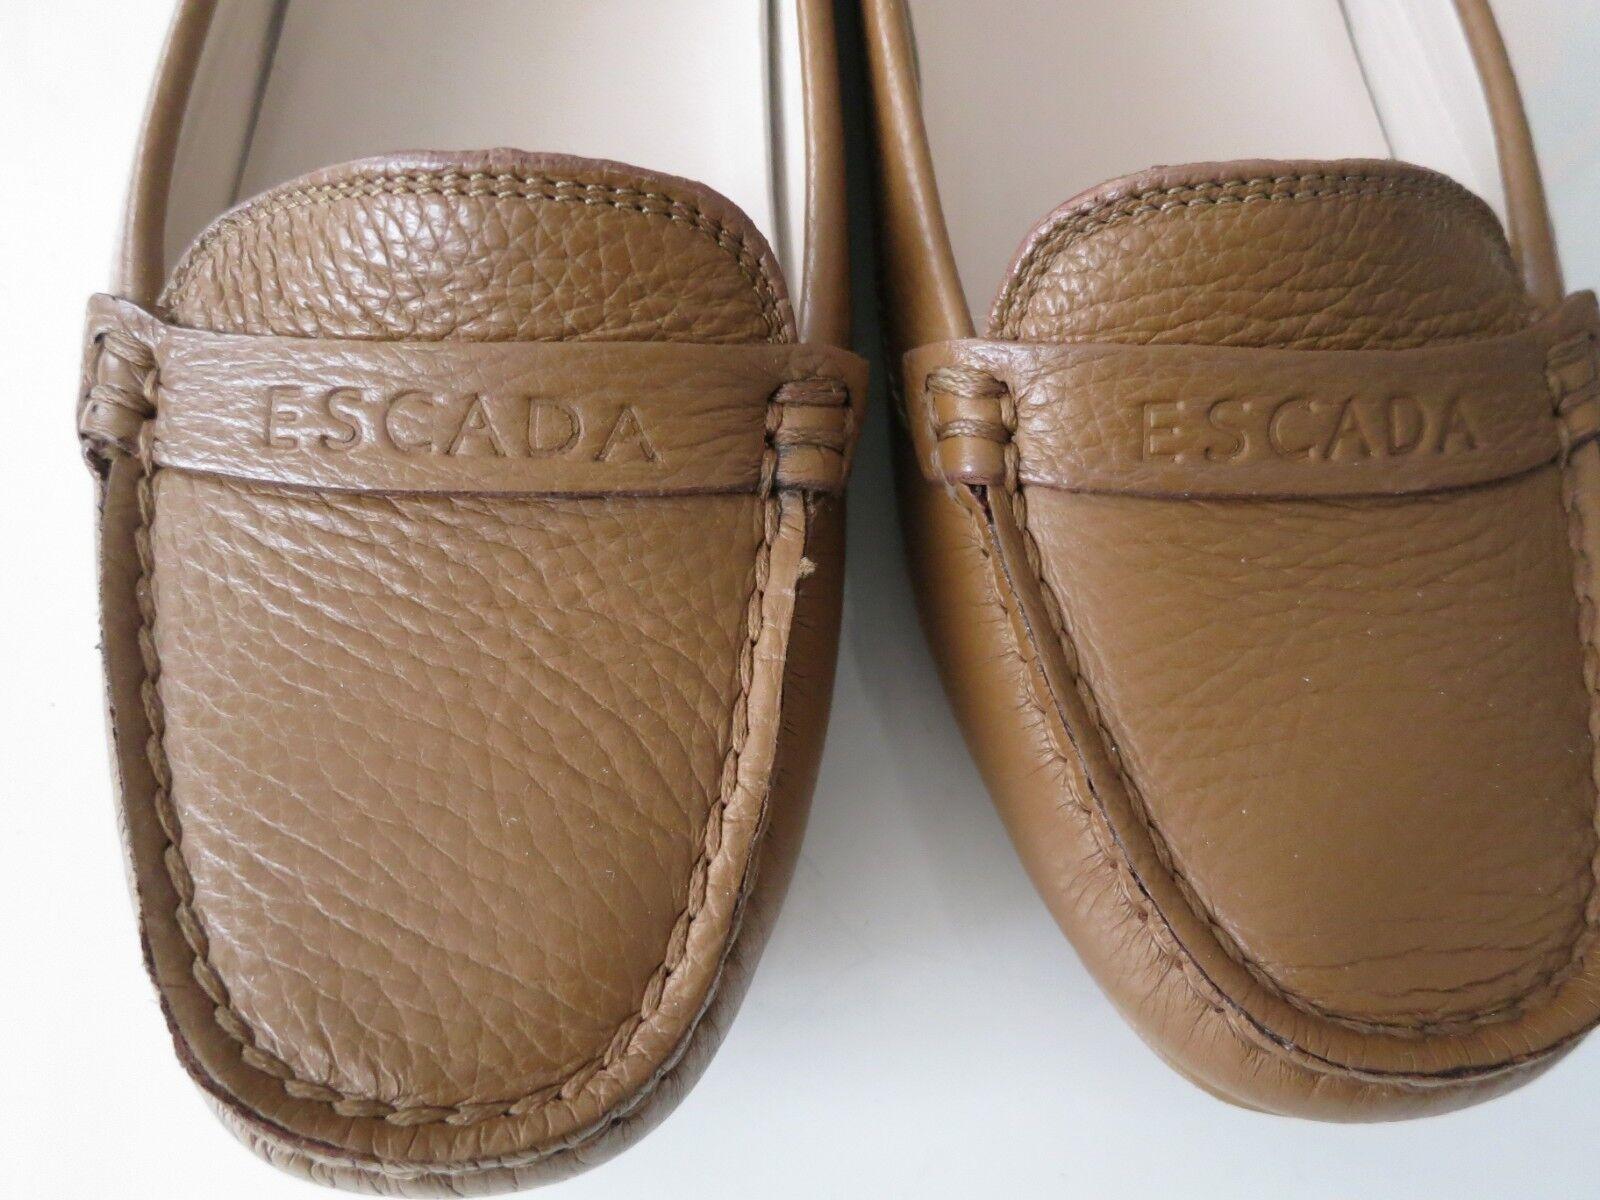 ESCADA, ESCADA, ESCADA, Slipper, braun, NP  , NEU, Echt Leder, EUR 38, Absatz 1 cm aa66f1